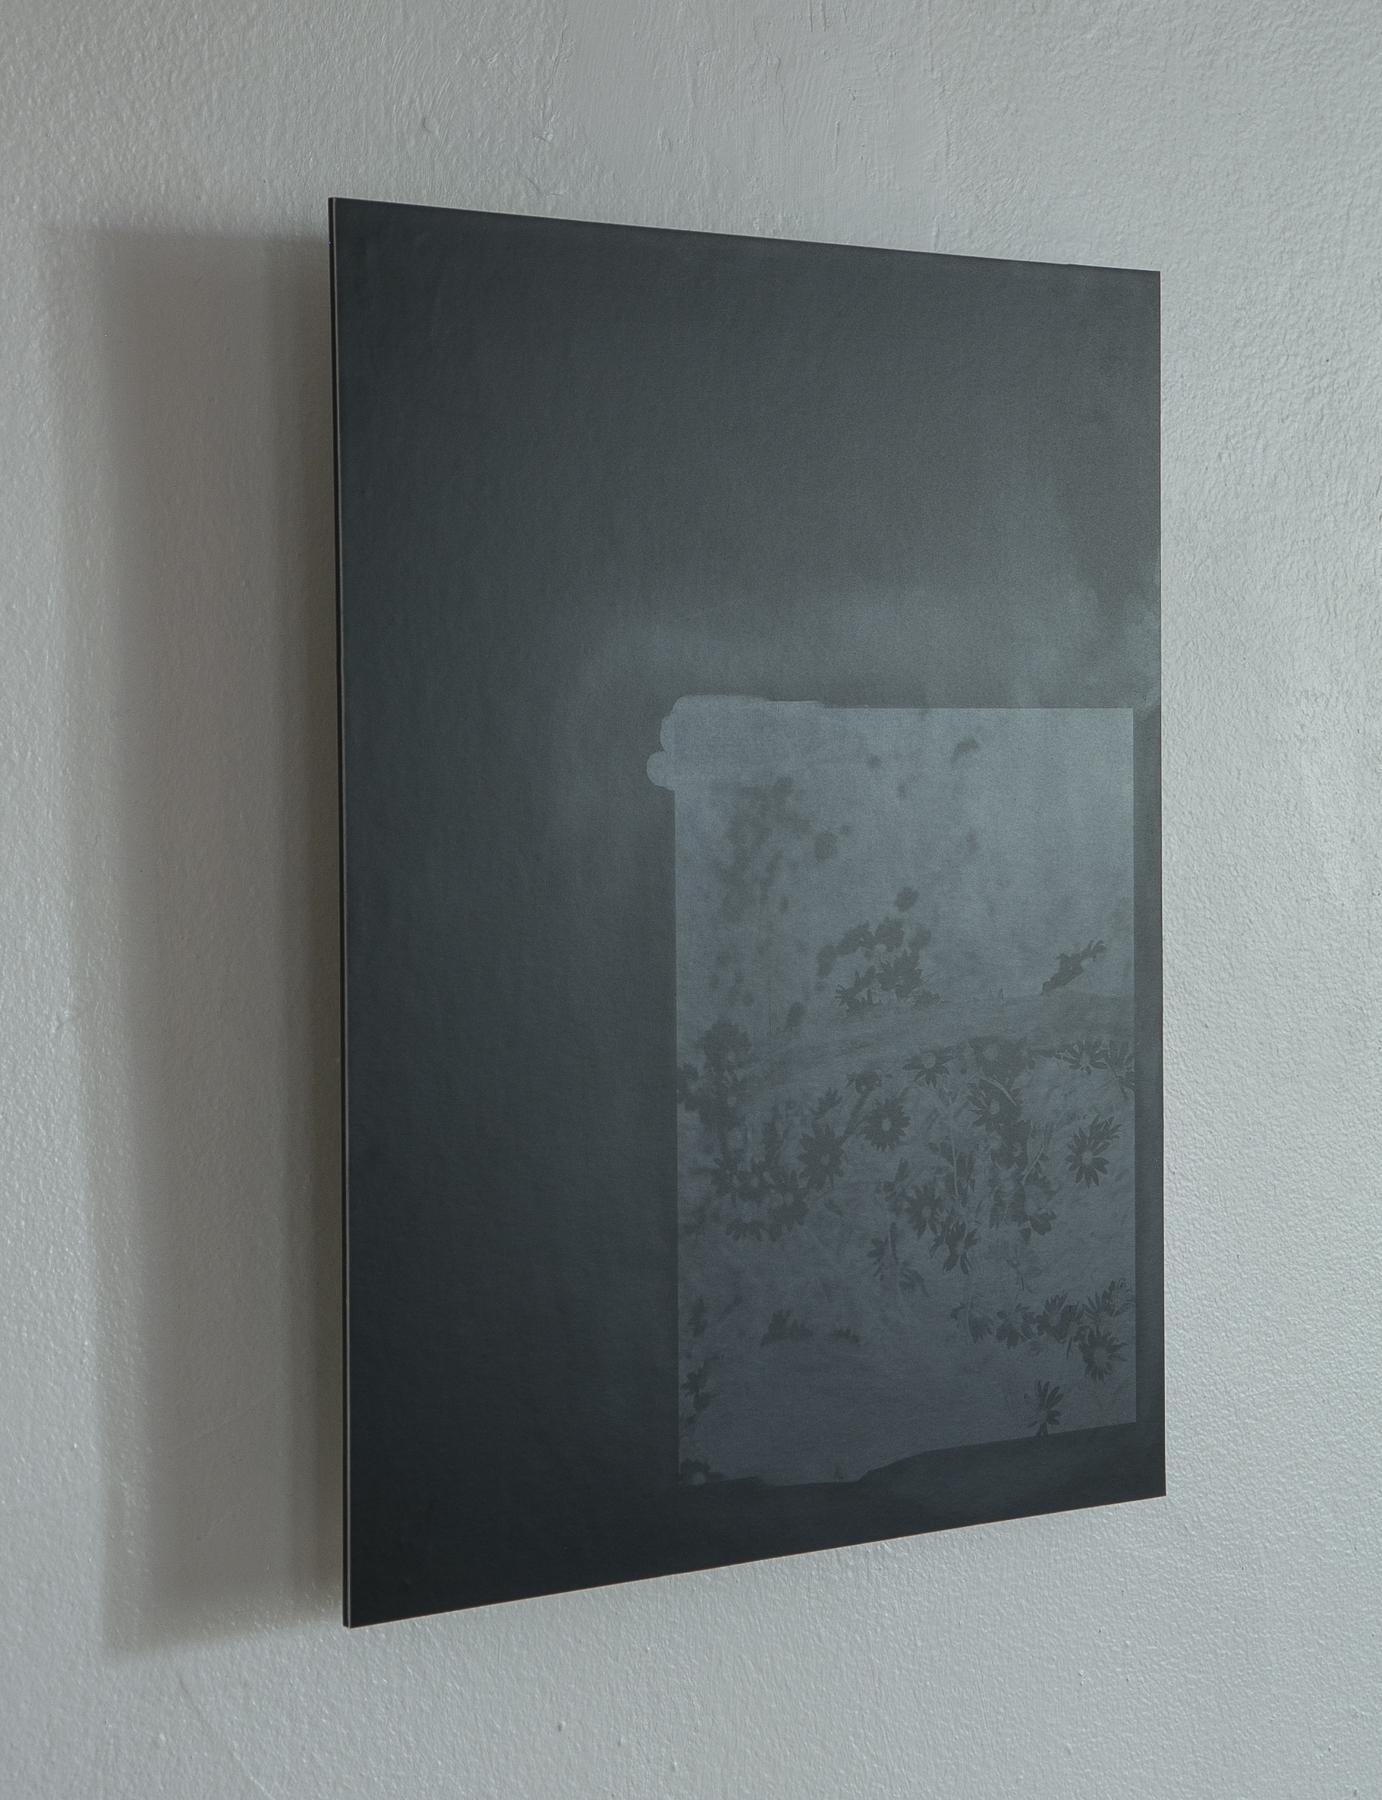 Daniel Hojnacki,  The falling of raking light upon a bed of flowers,  Silver gelatin lumen print on dibond, 2019